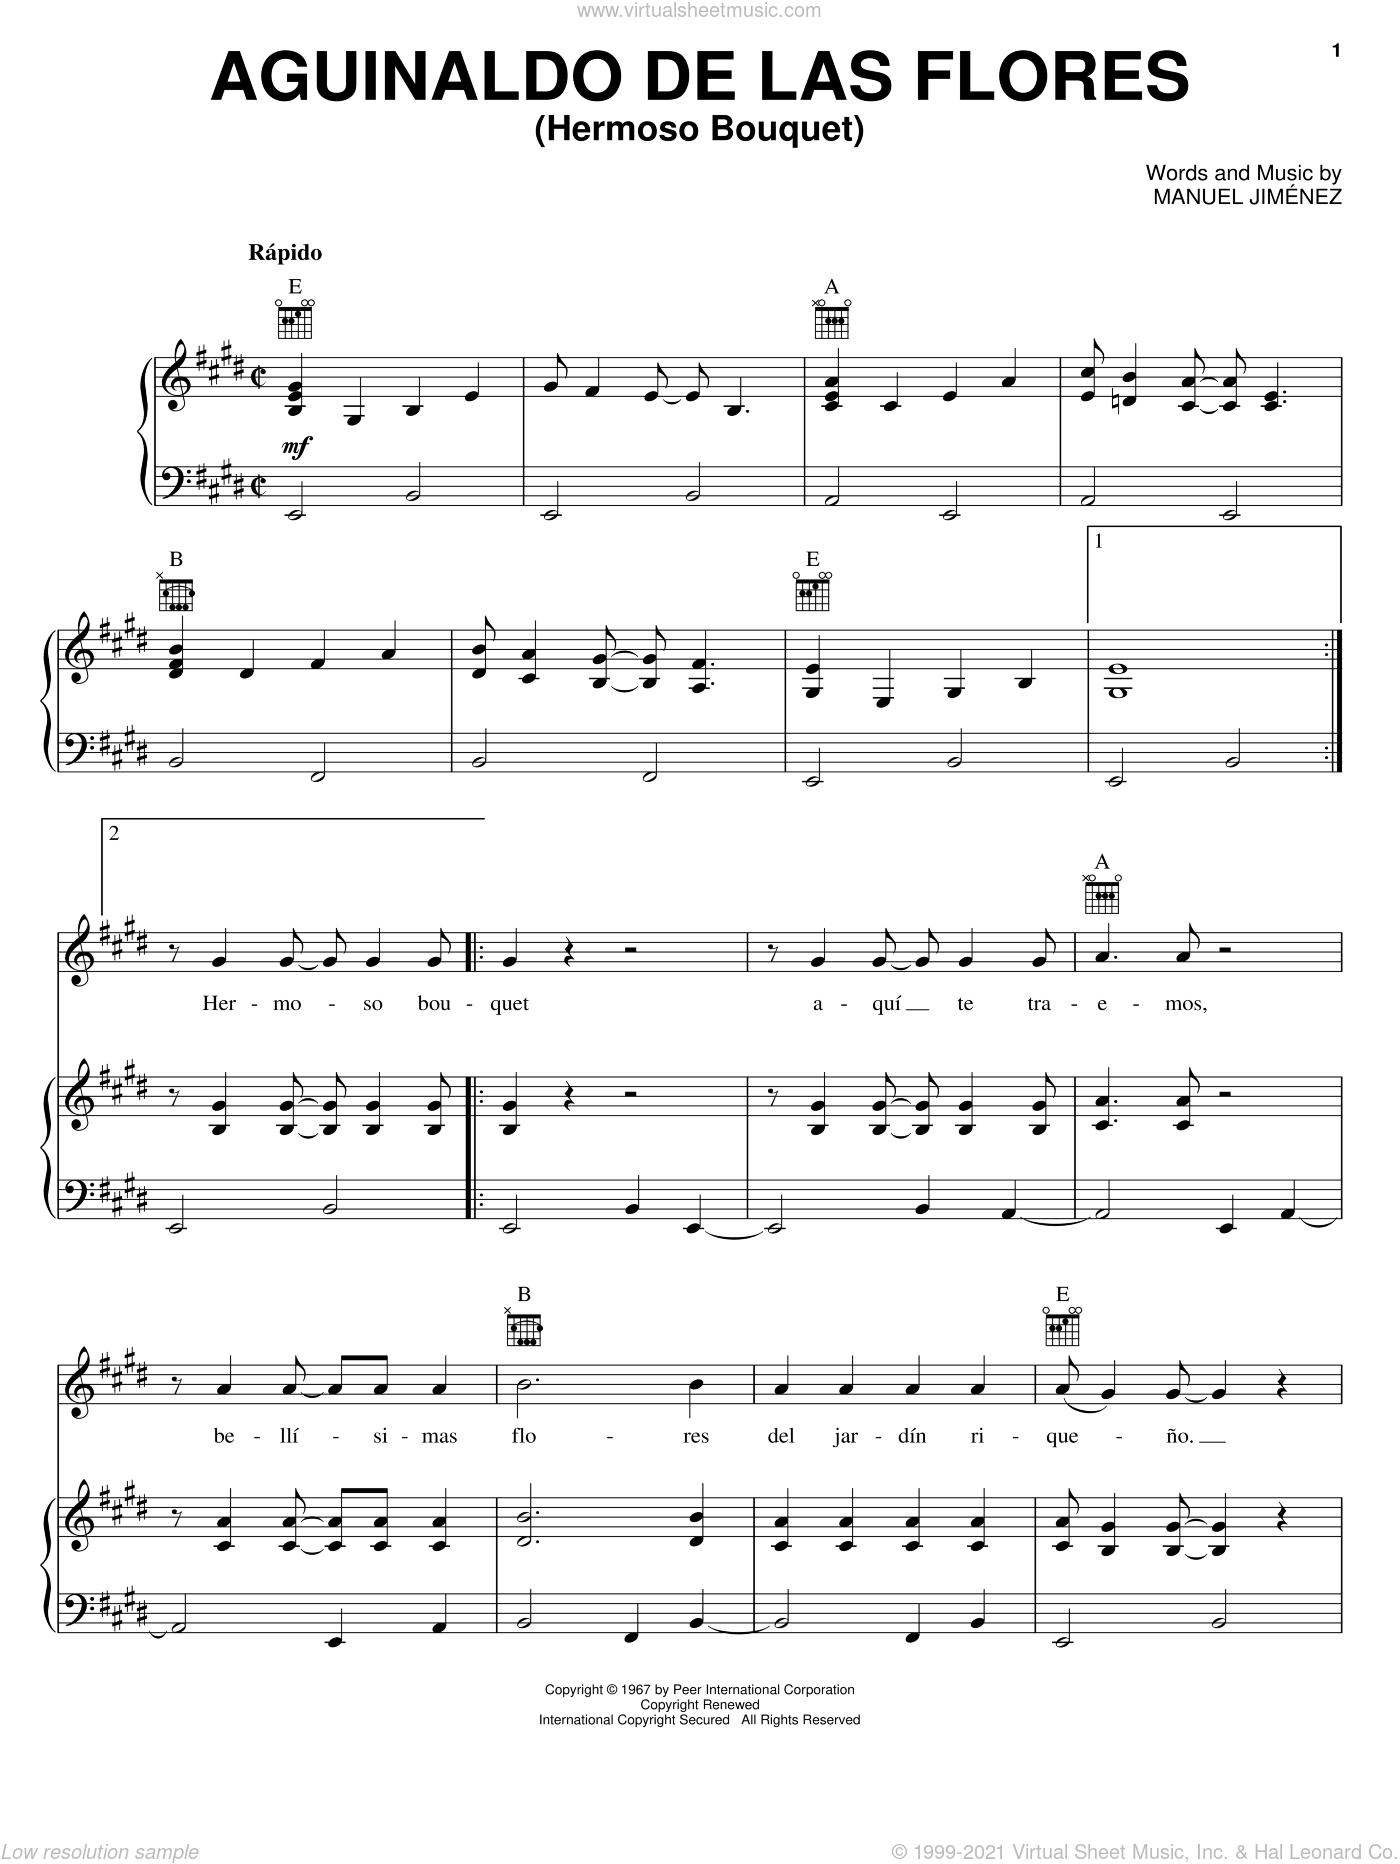 Aguinaldo De Las Flores (Hermoso Bouquet) sheet music for voice, piano or guitar by Manuel Jimenez, intermediate skill level